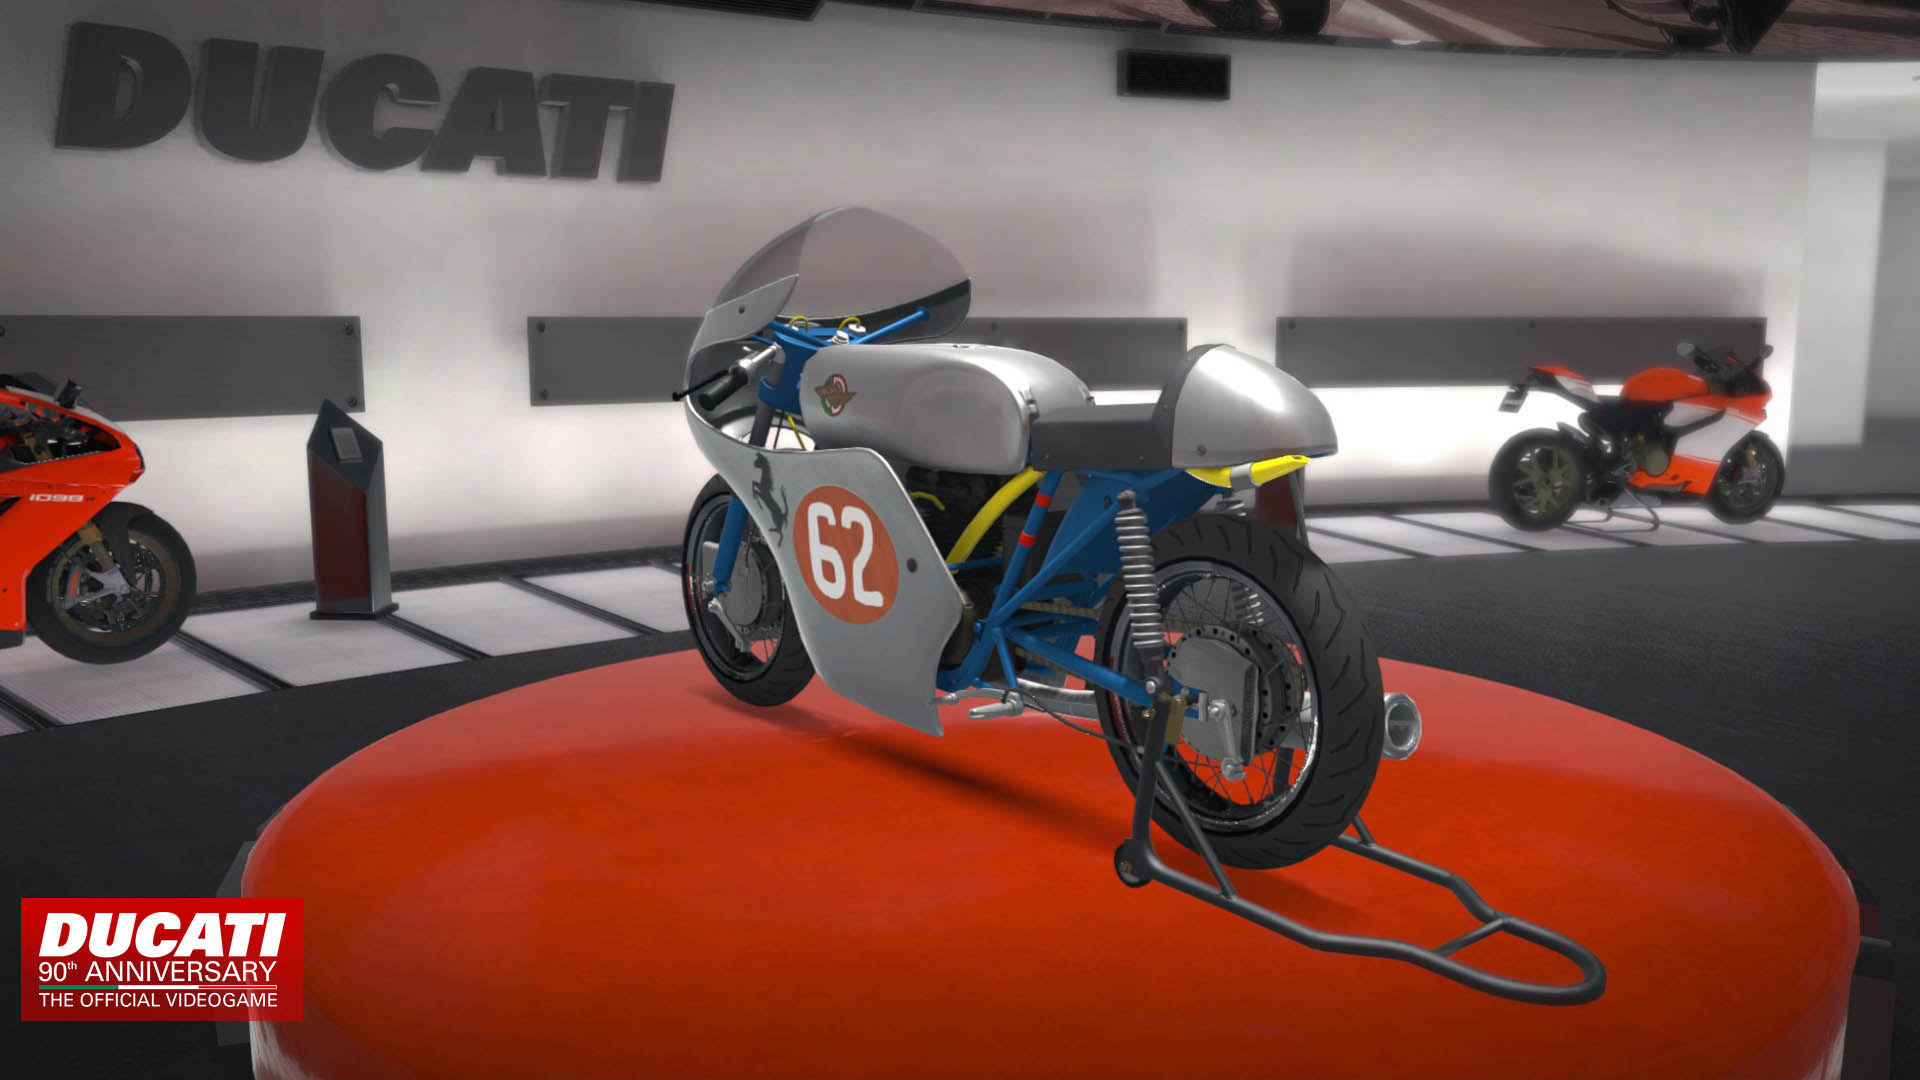 DUCATI - 90th Anniversary screenshot